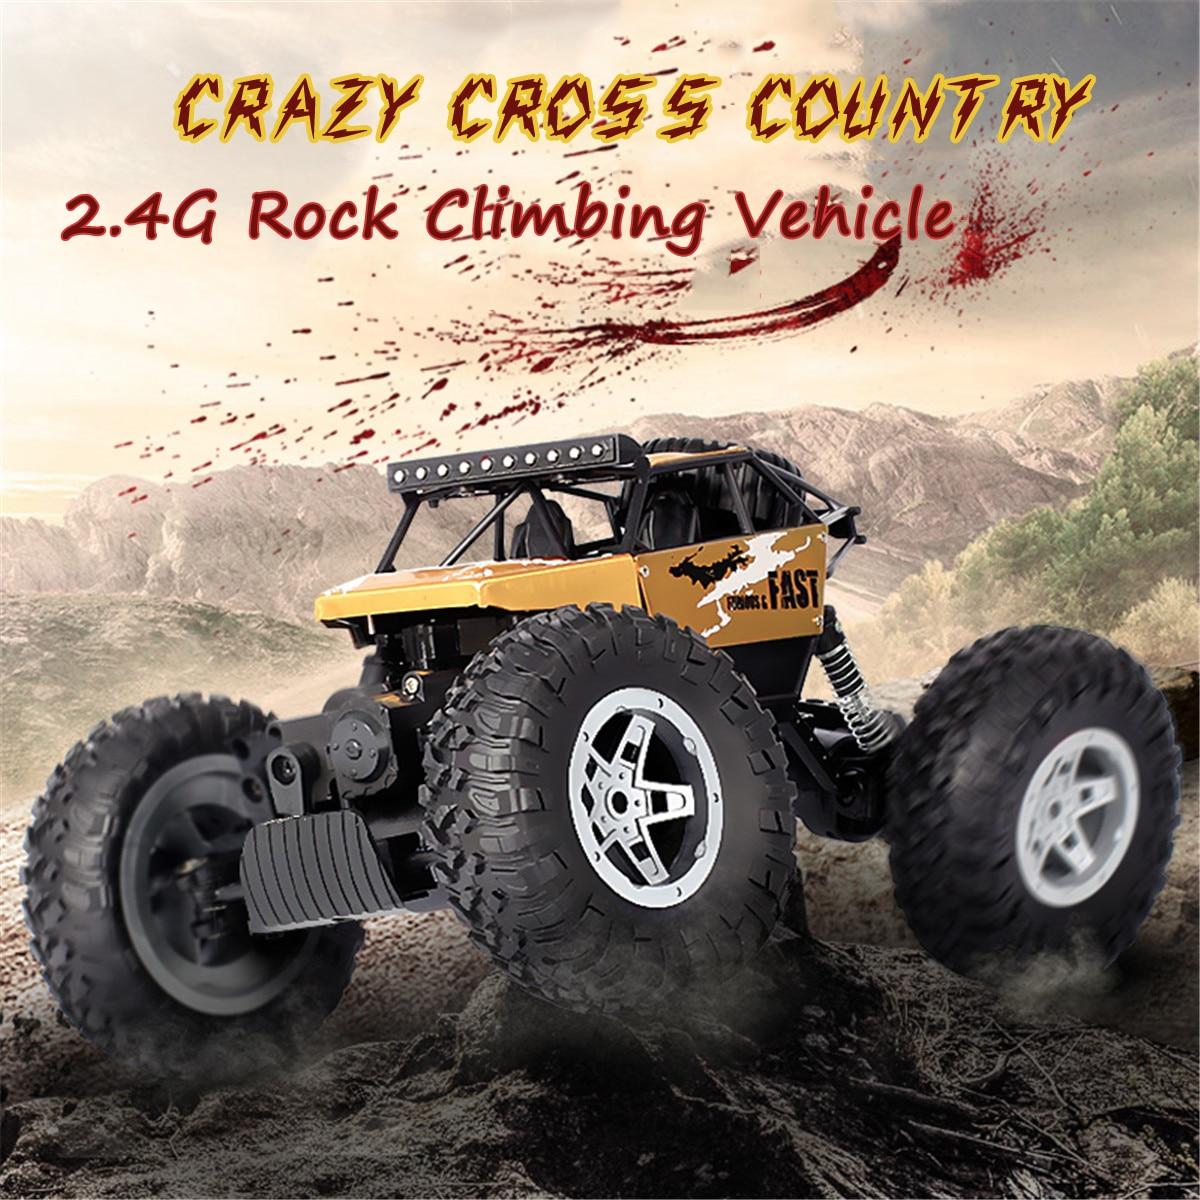 купить 2Colors RC Truck 4WD Off-Road 1:16 Vehicle 2.4 G Remote Control Buggy Crawler Car Supersonic Truck Off-Road Vehicle Buggy Elect по цене 1791.05 рублей